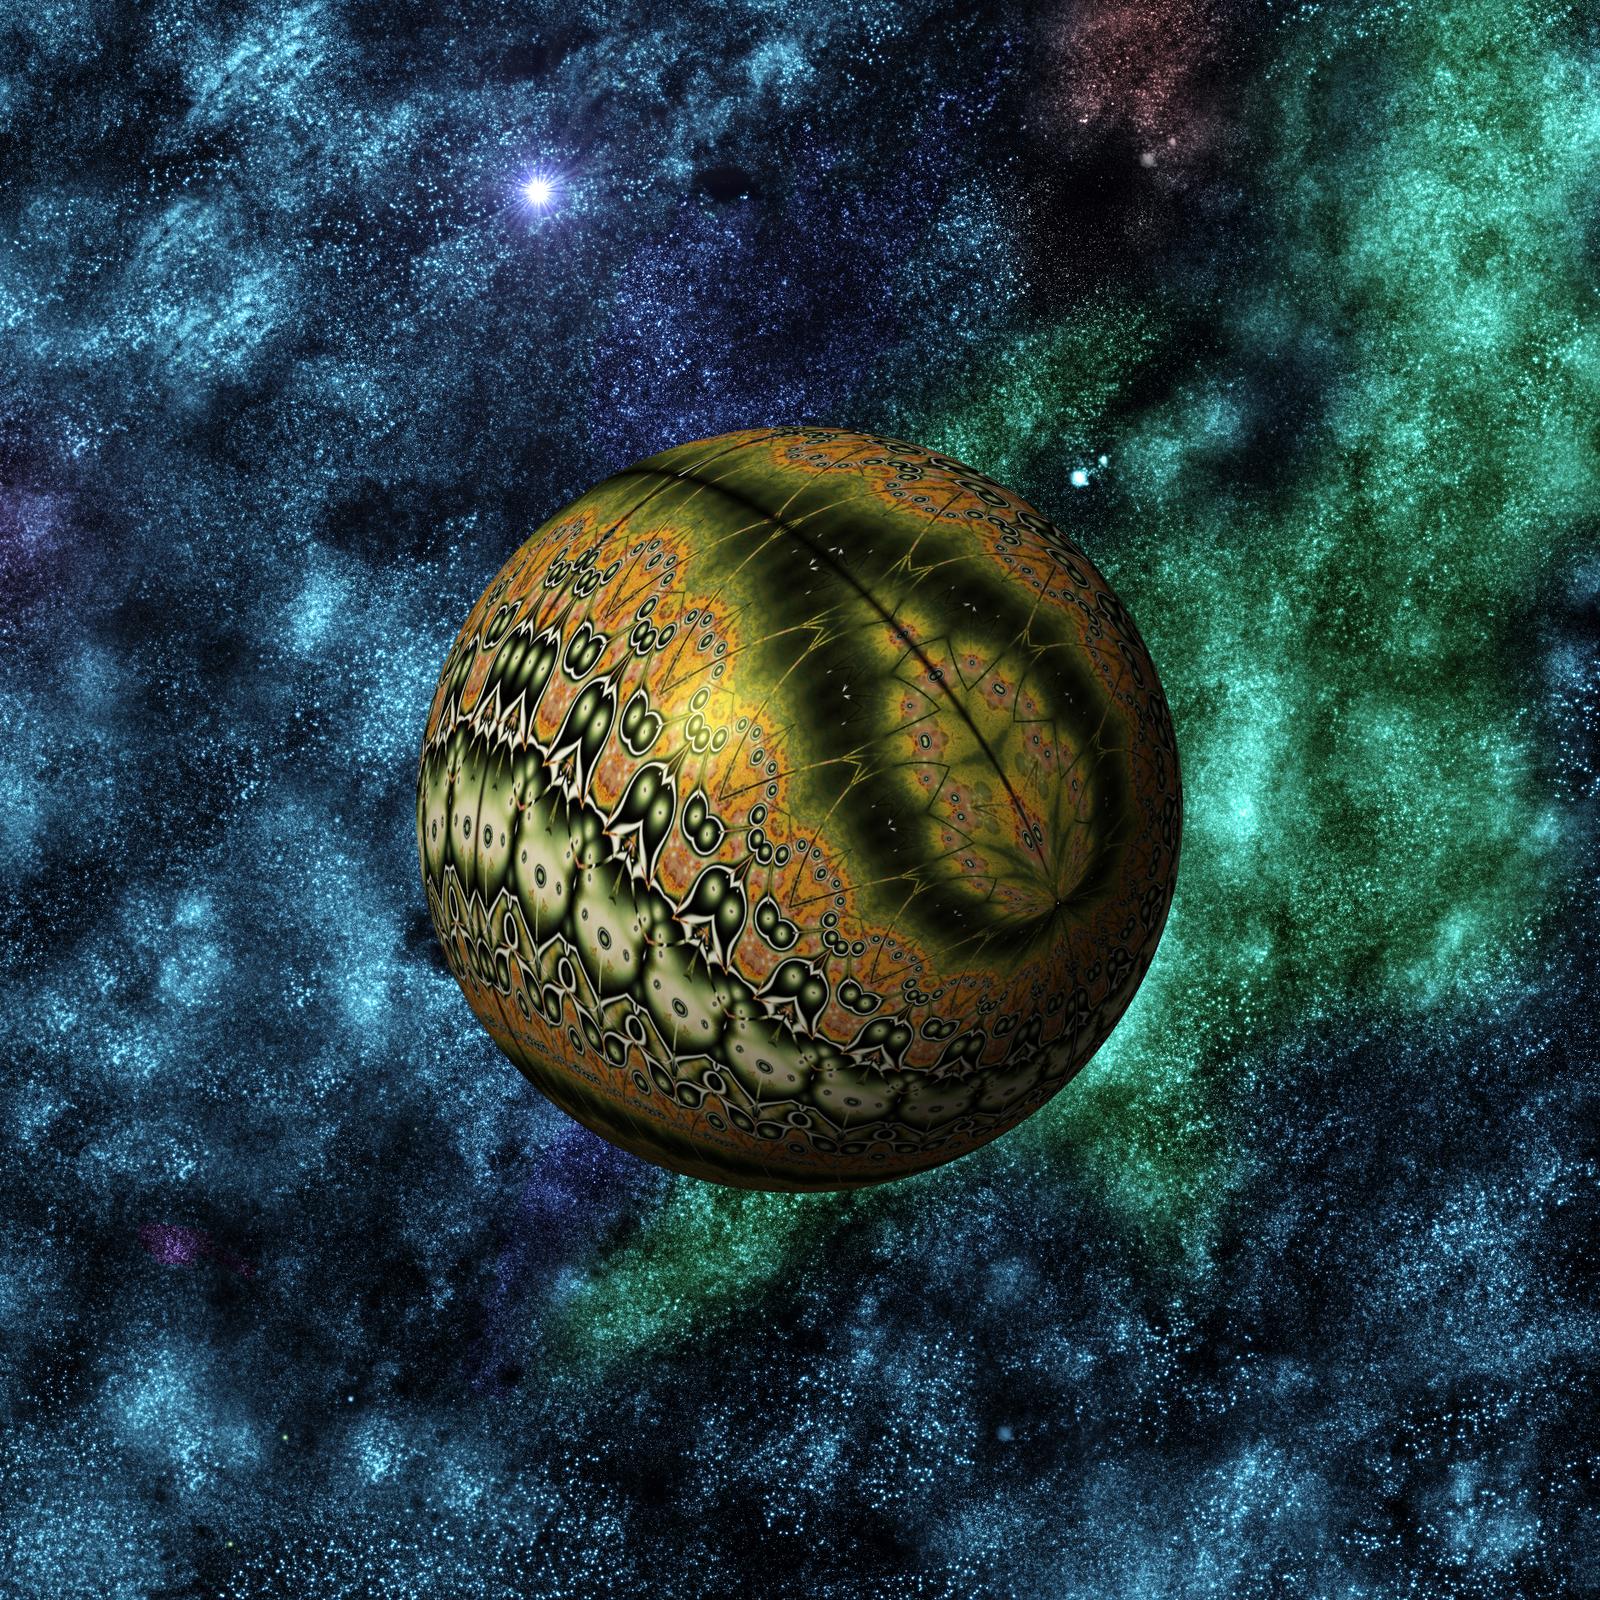 El Planeta Hullandwa by Jakeukalane